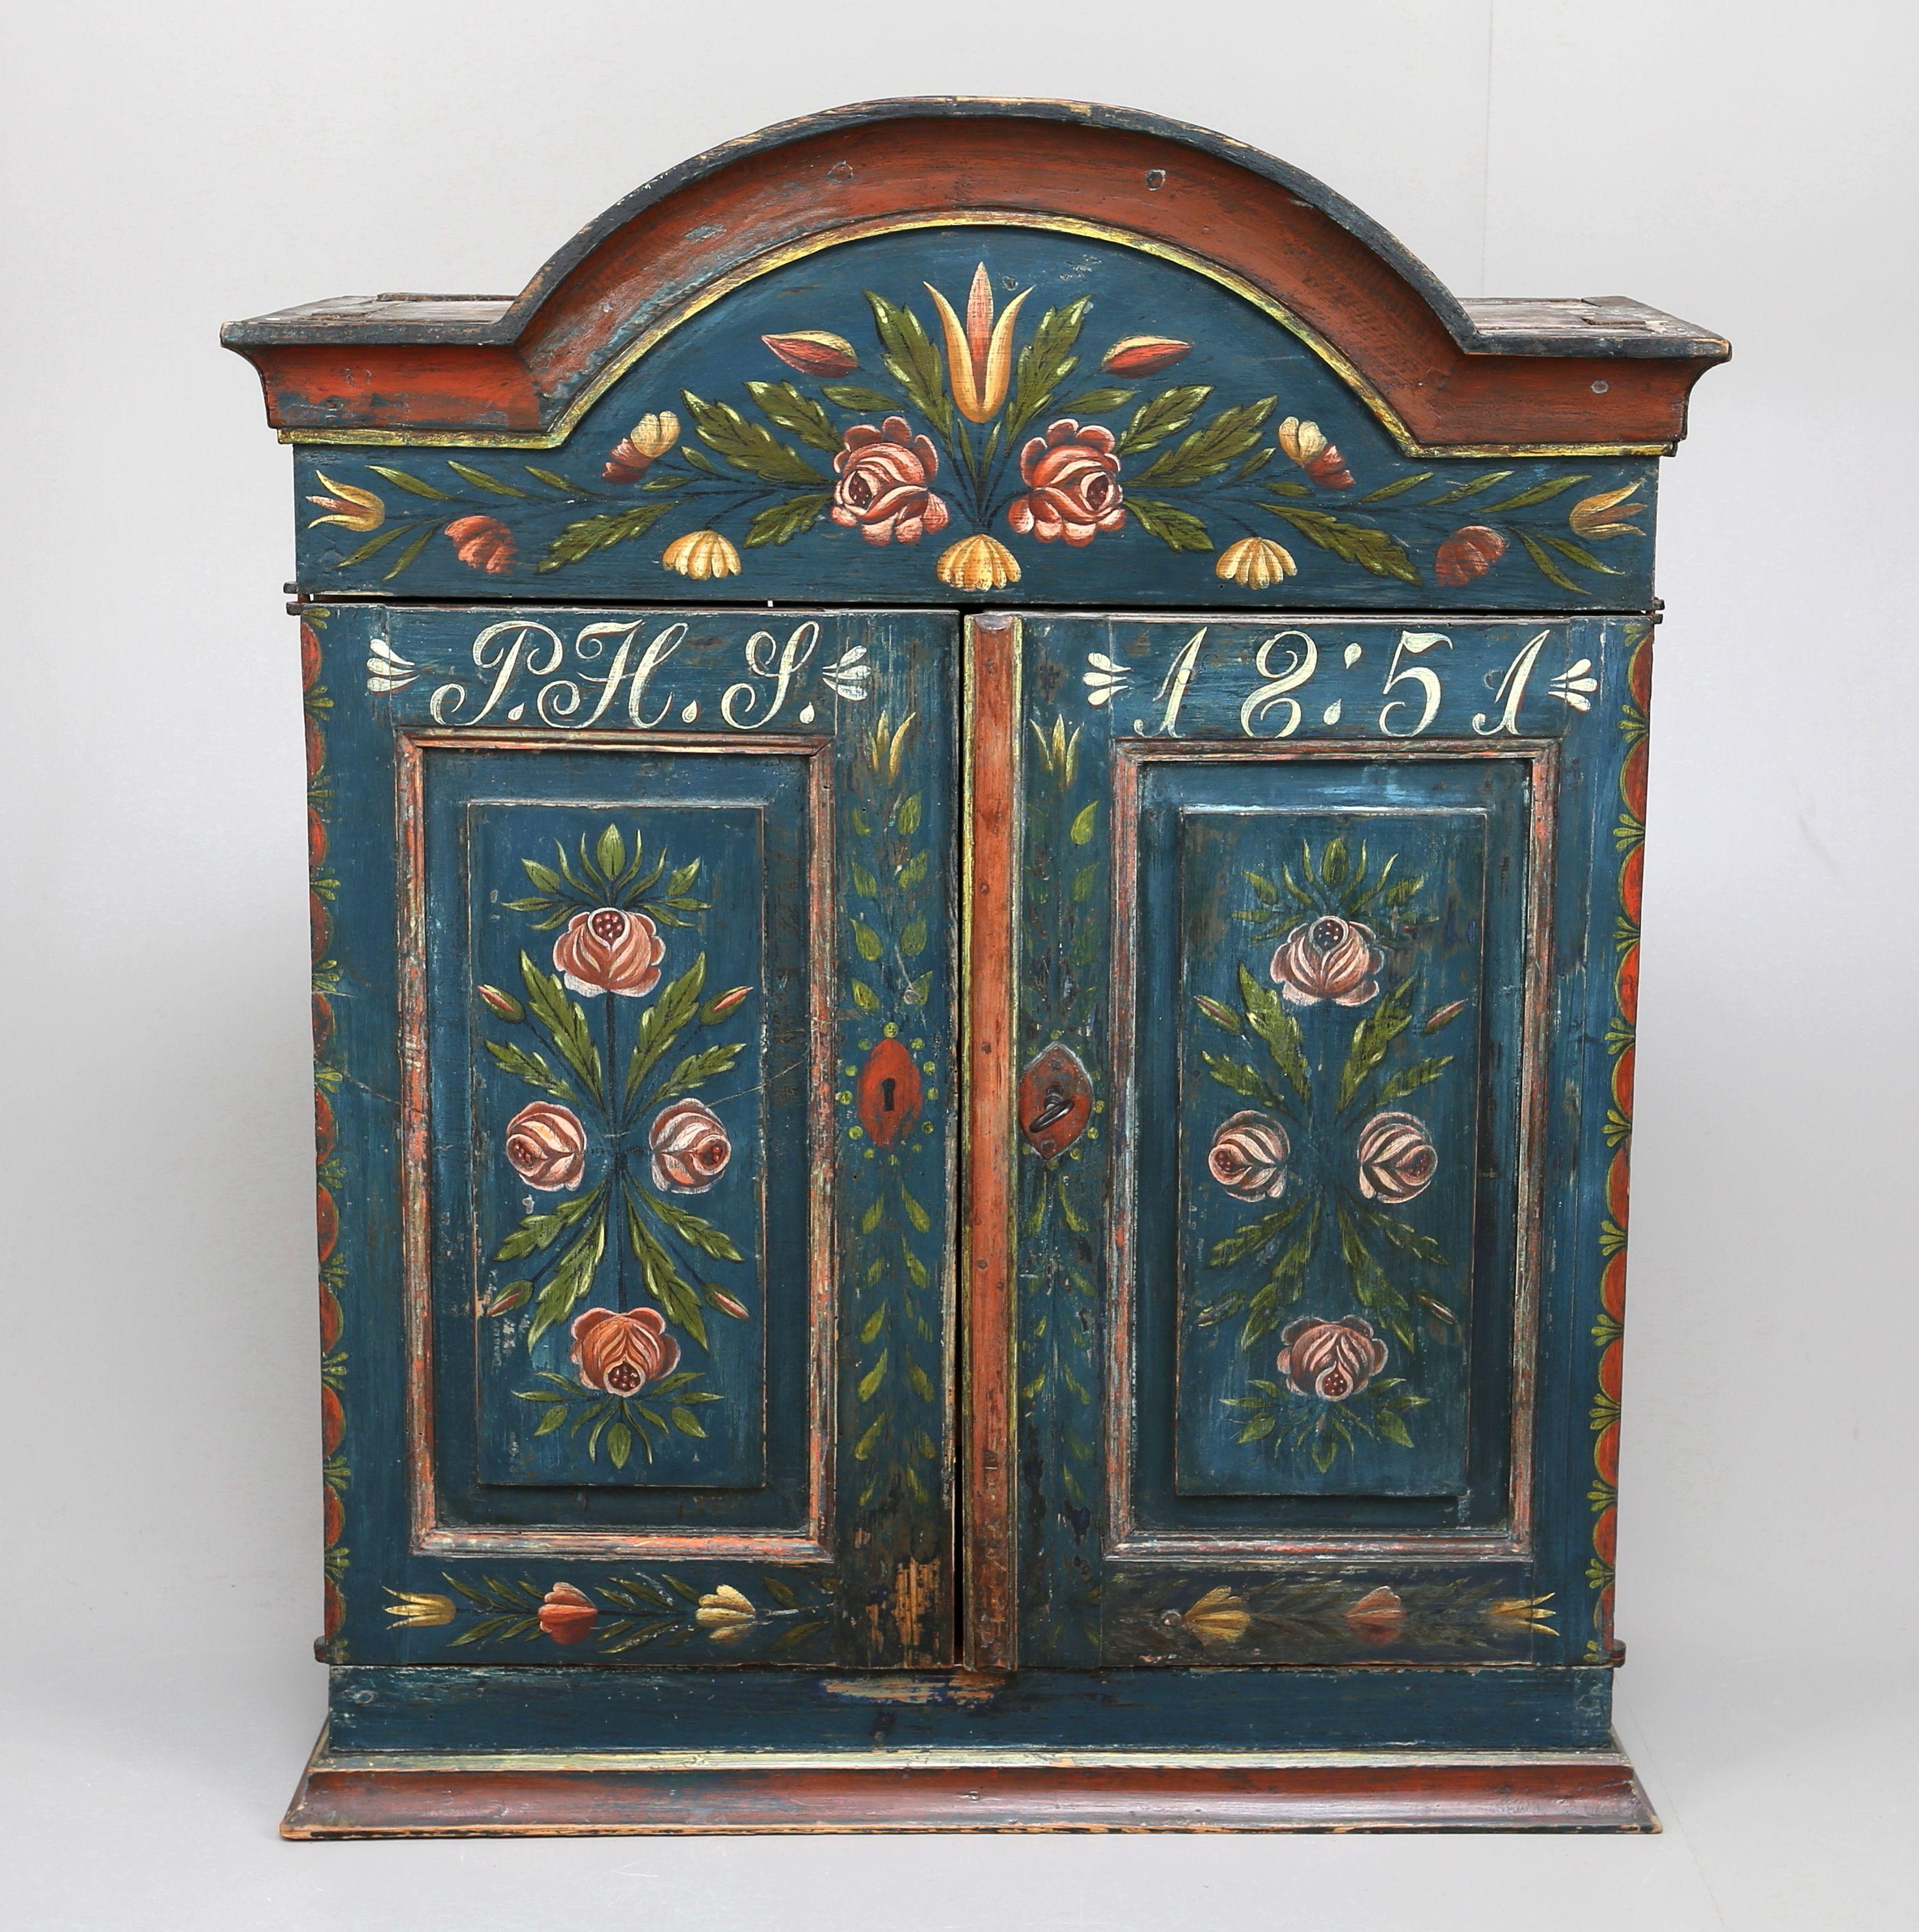 Vaggskap Allmoge Daterat 1851 Swedish Furniture Scandinavian Folk Art Art Furniture